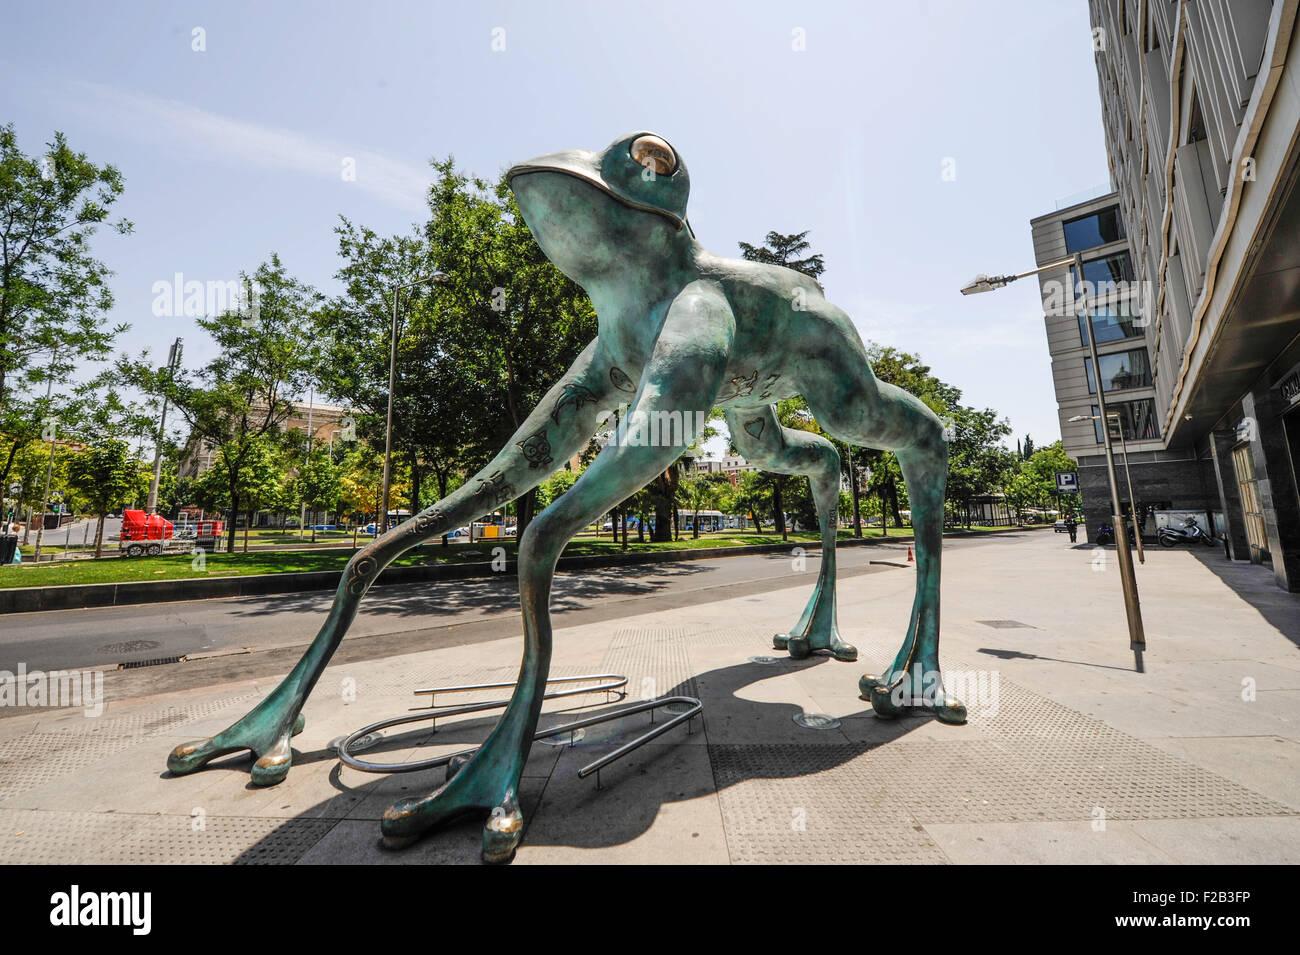 Statue of a frog for good luck in Madrid- estatua de una rana para suerte en Madrid - Stock Image